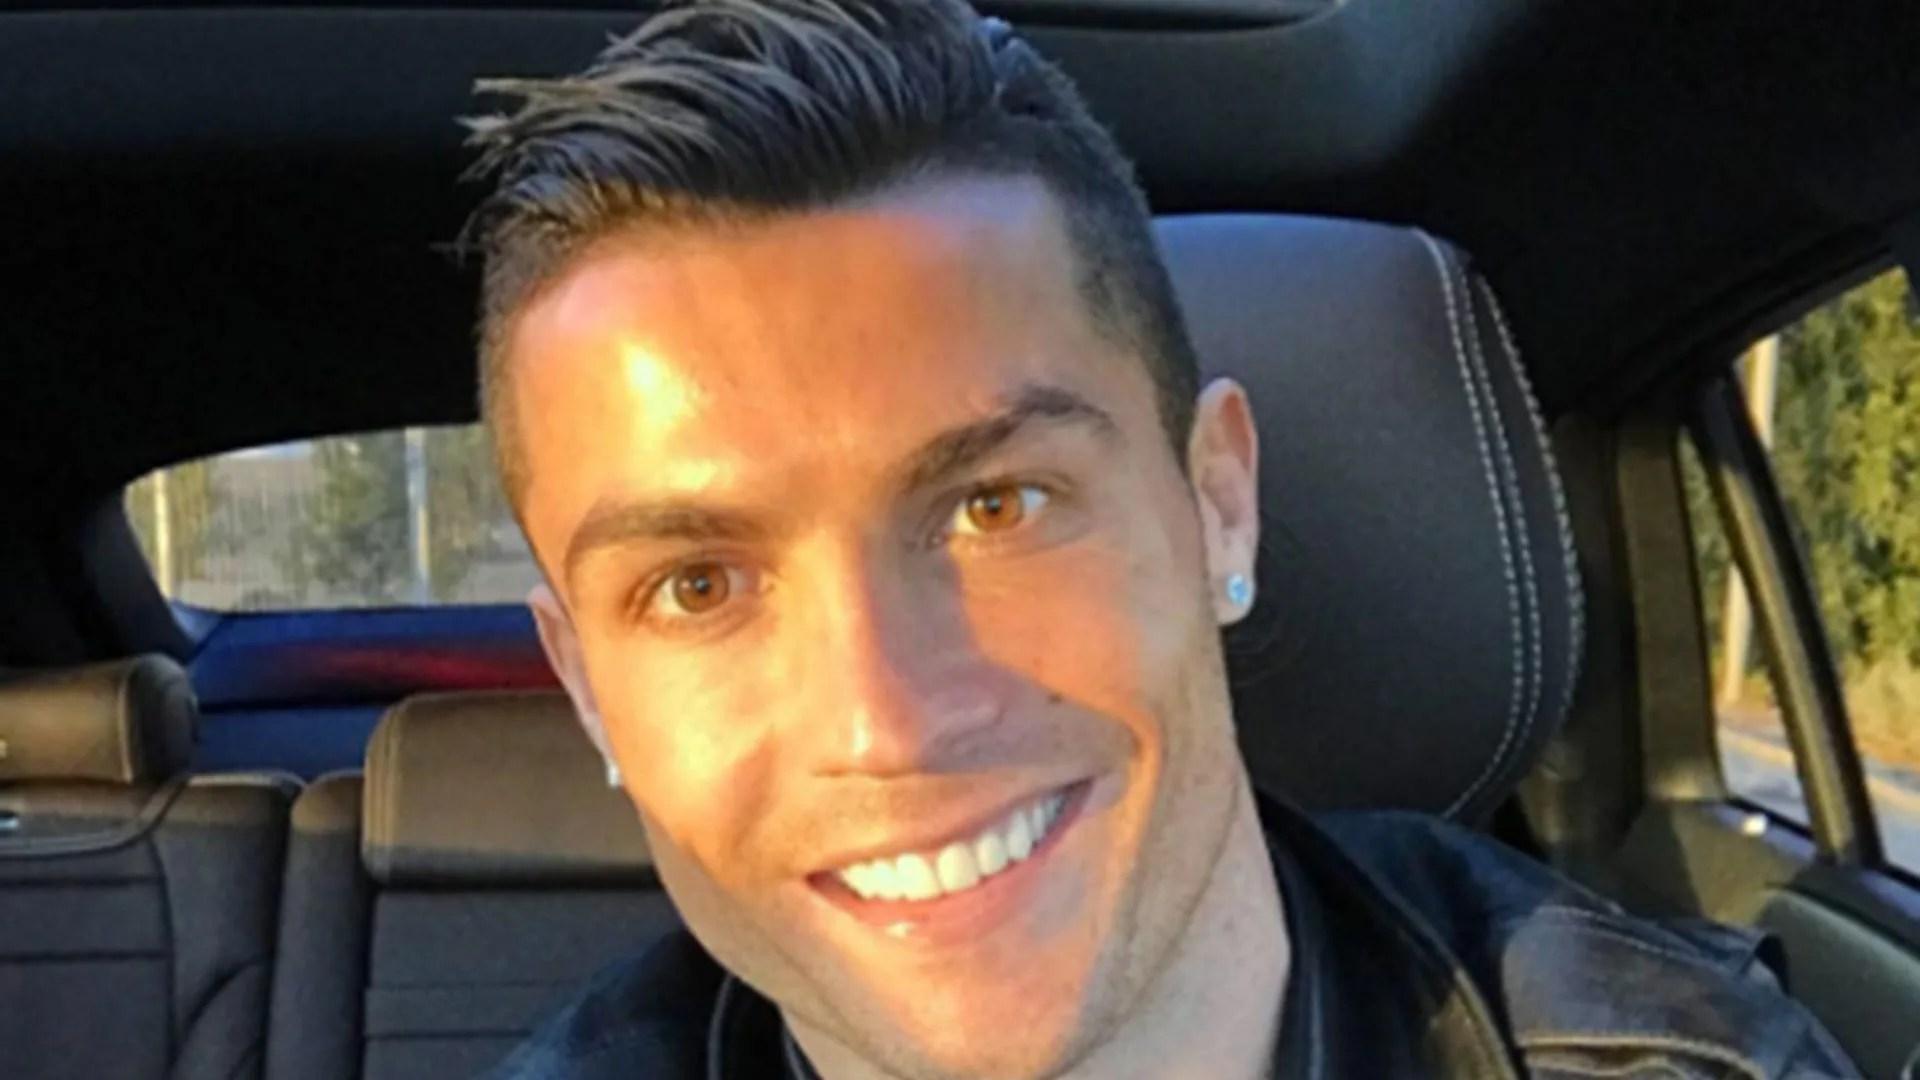 Cristiano Ronaldo Marks Birthday On Instagram With Son